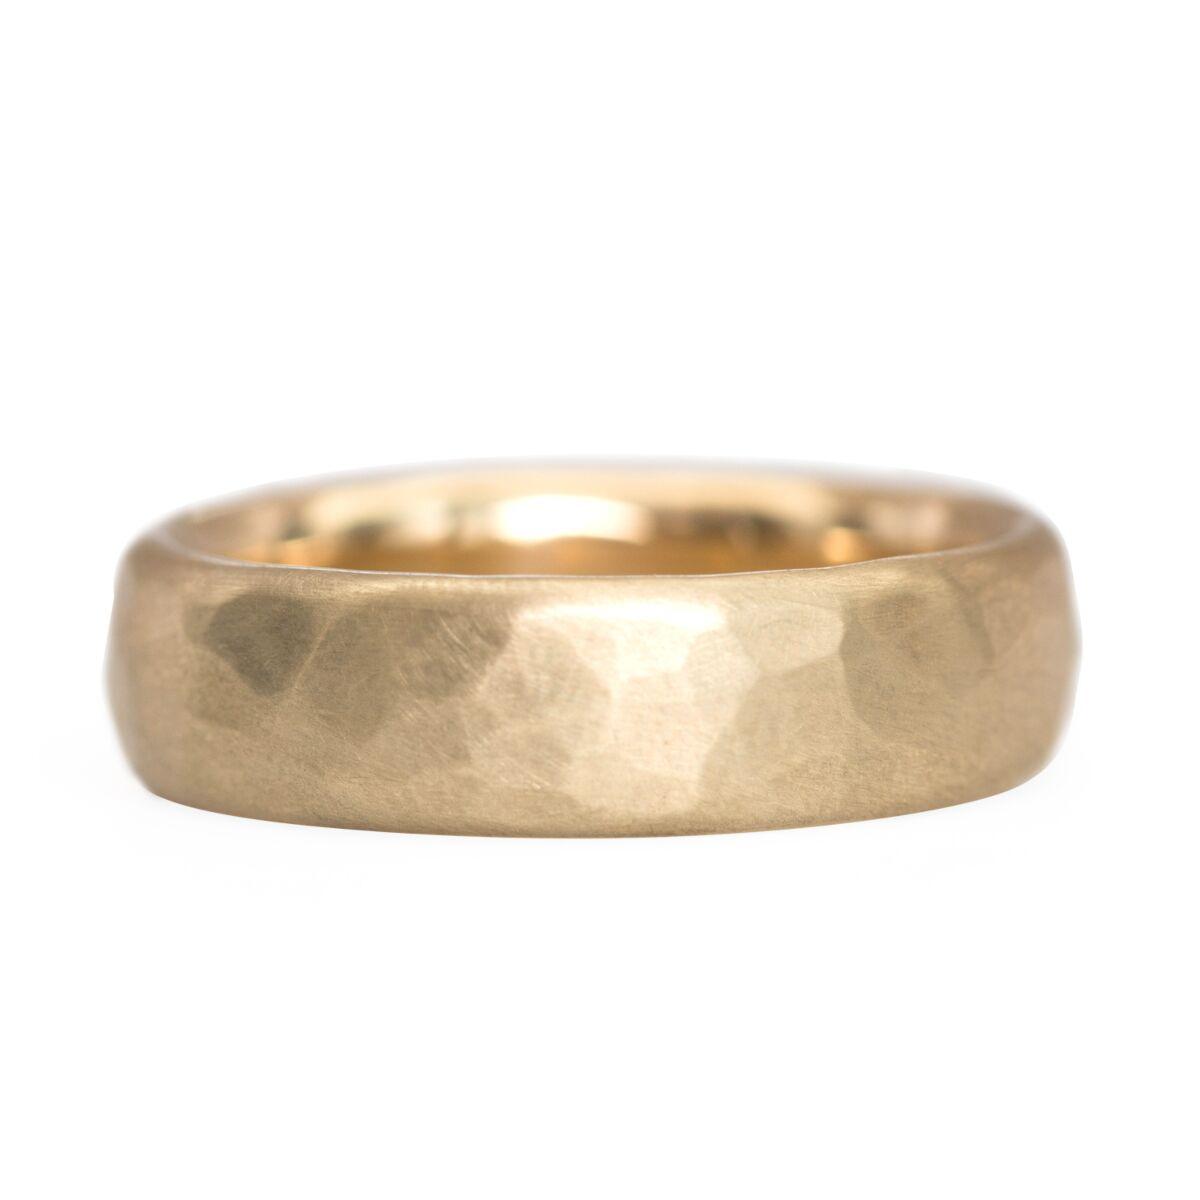 Cowboy Ring, 6mm image